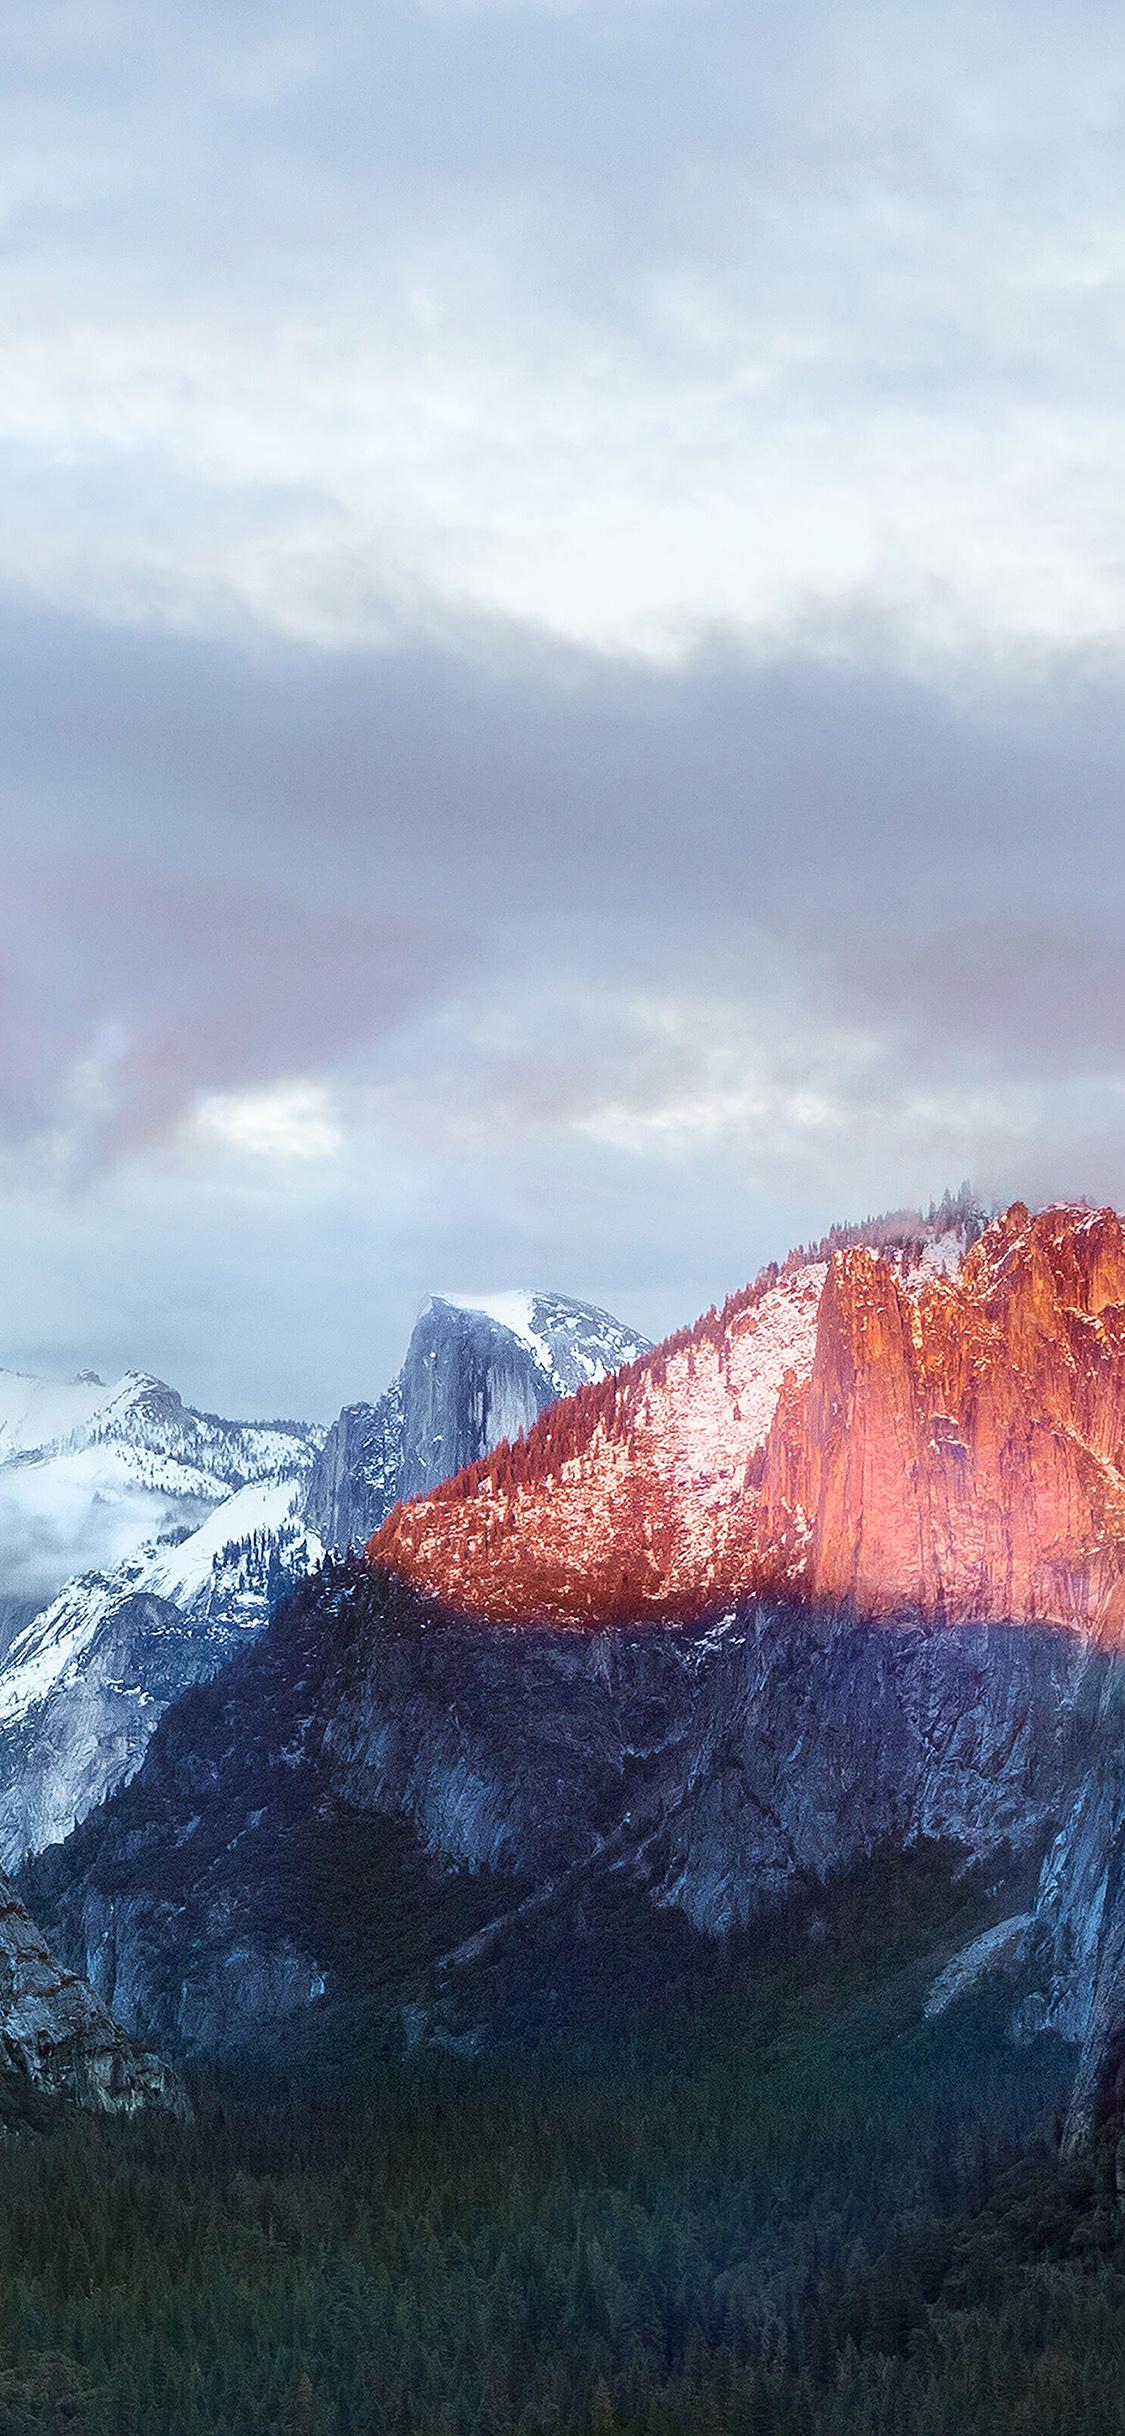 Am88 Apple El Capitan Osx Mac Mountain Wwdc Art